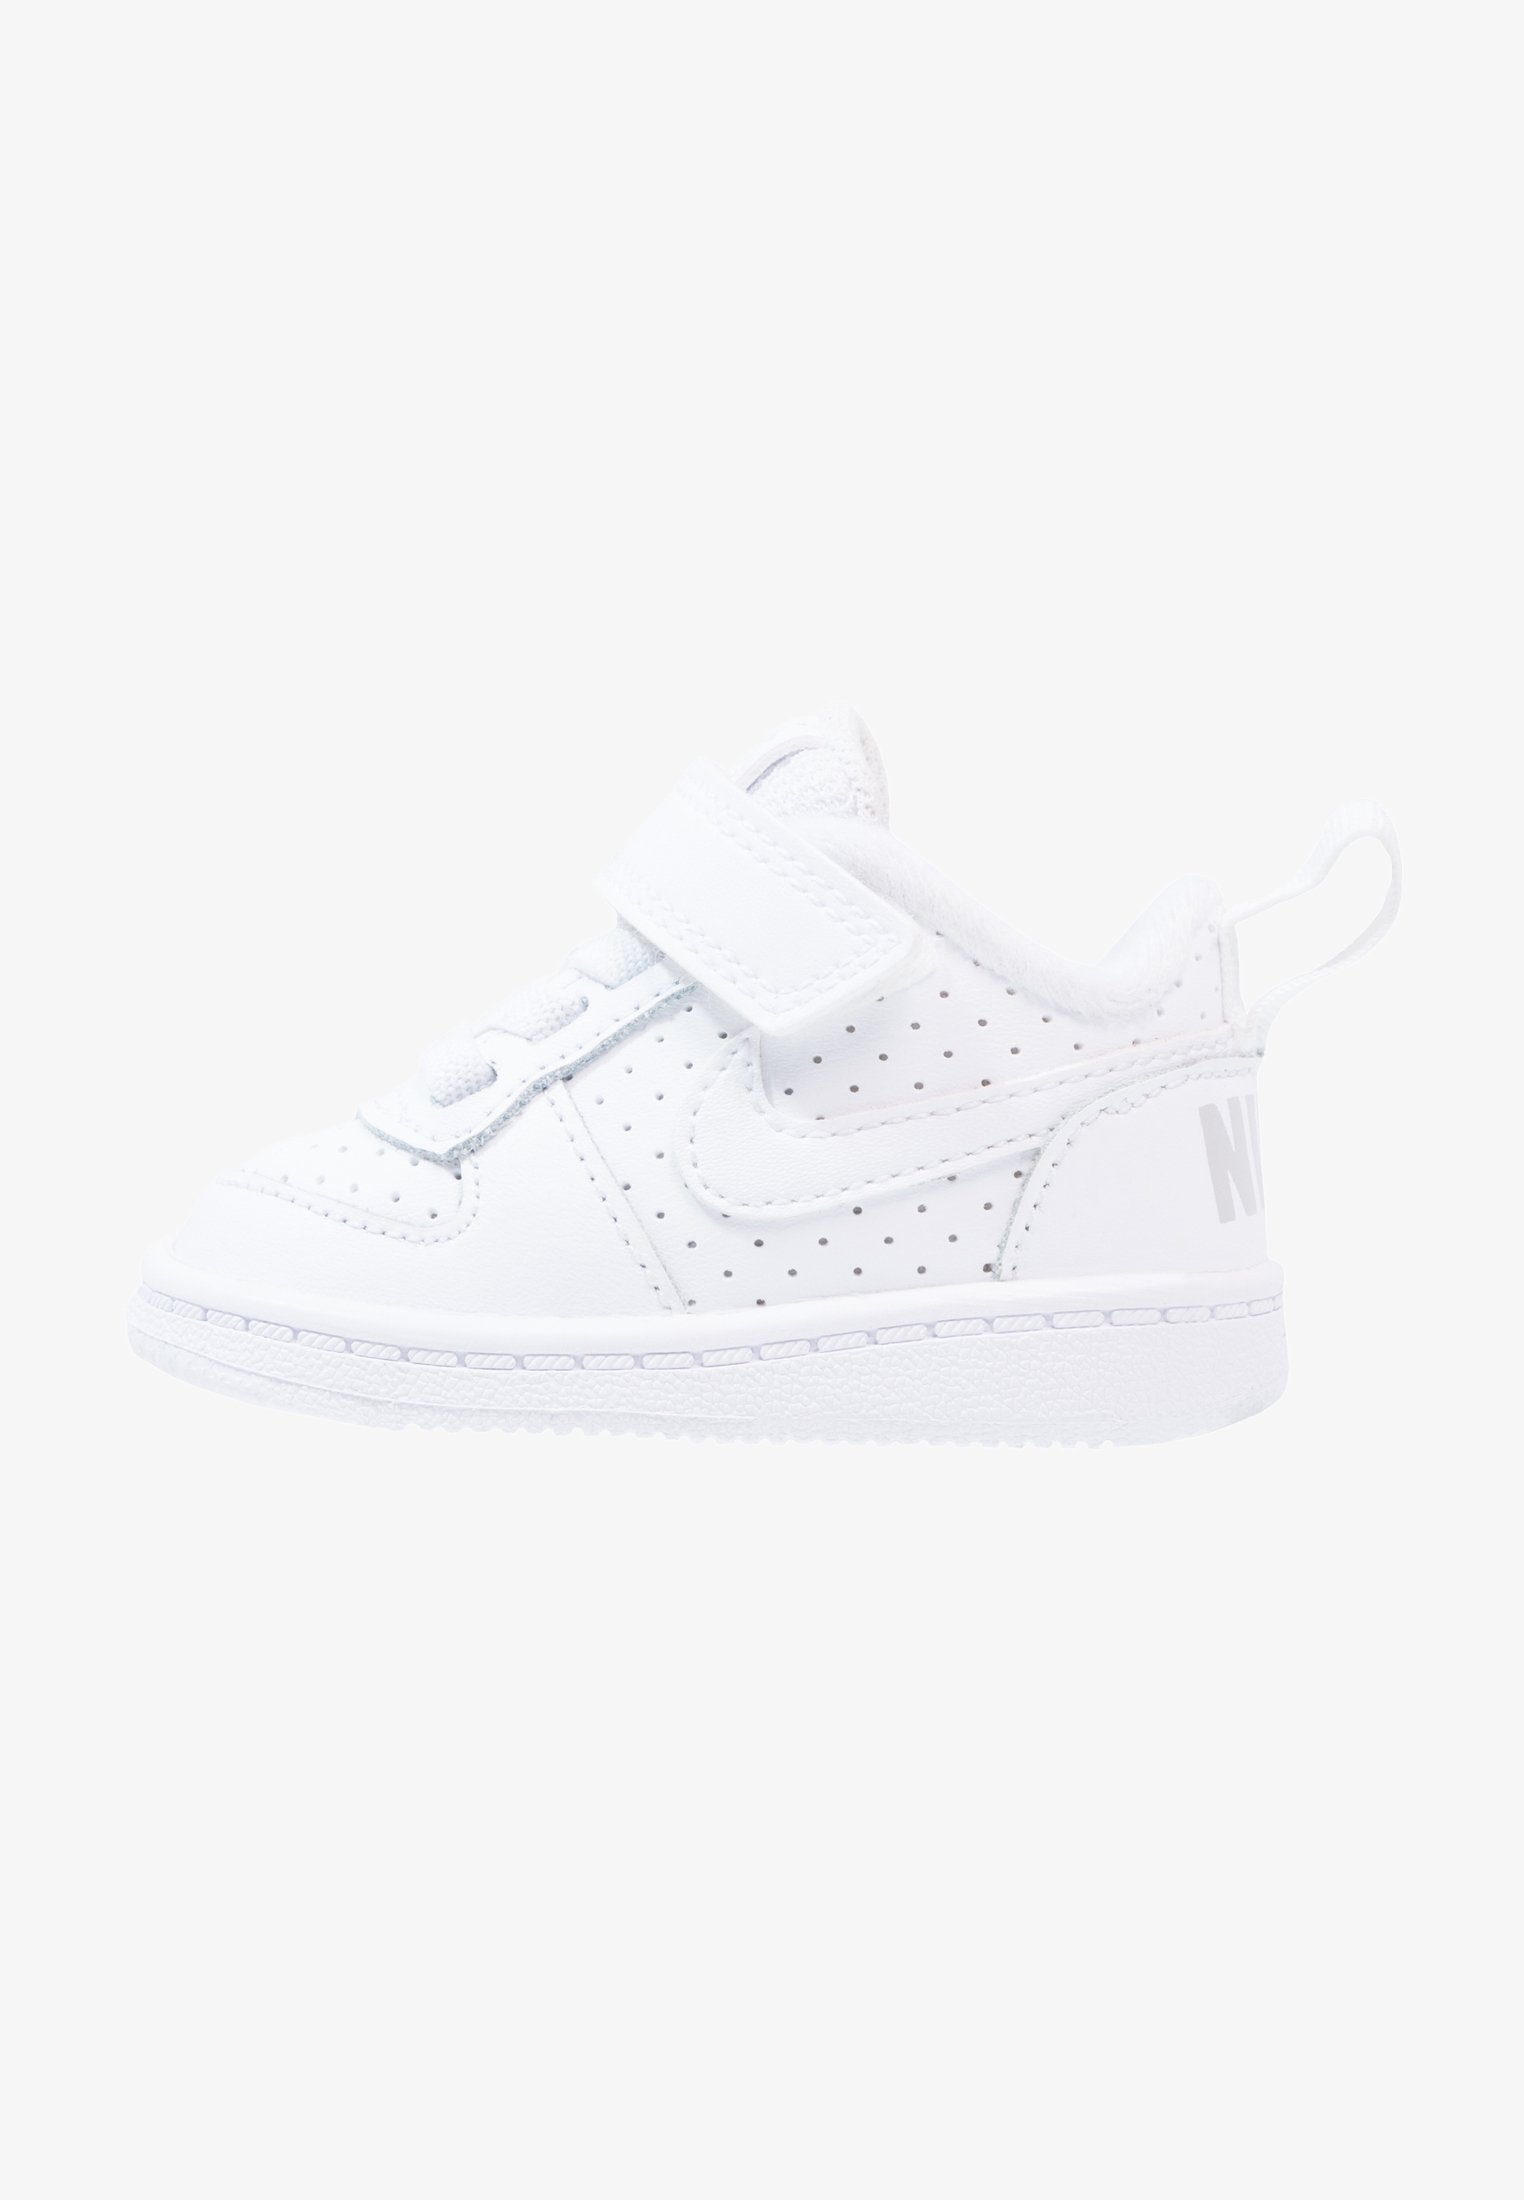 Obligar Interrupción Empresario  Nike Sportswear COURT BOROUGH - Zapatos de bebé - white/blanco - Zalando.es